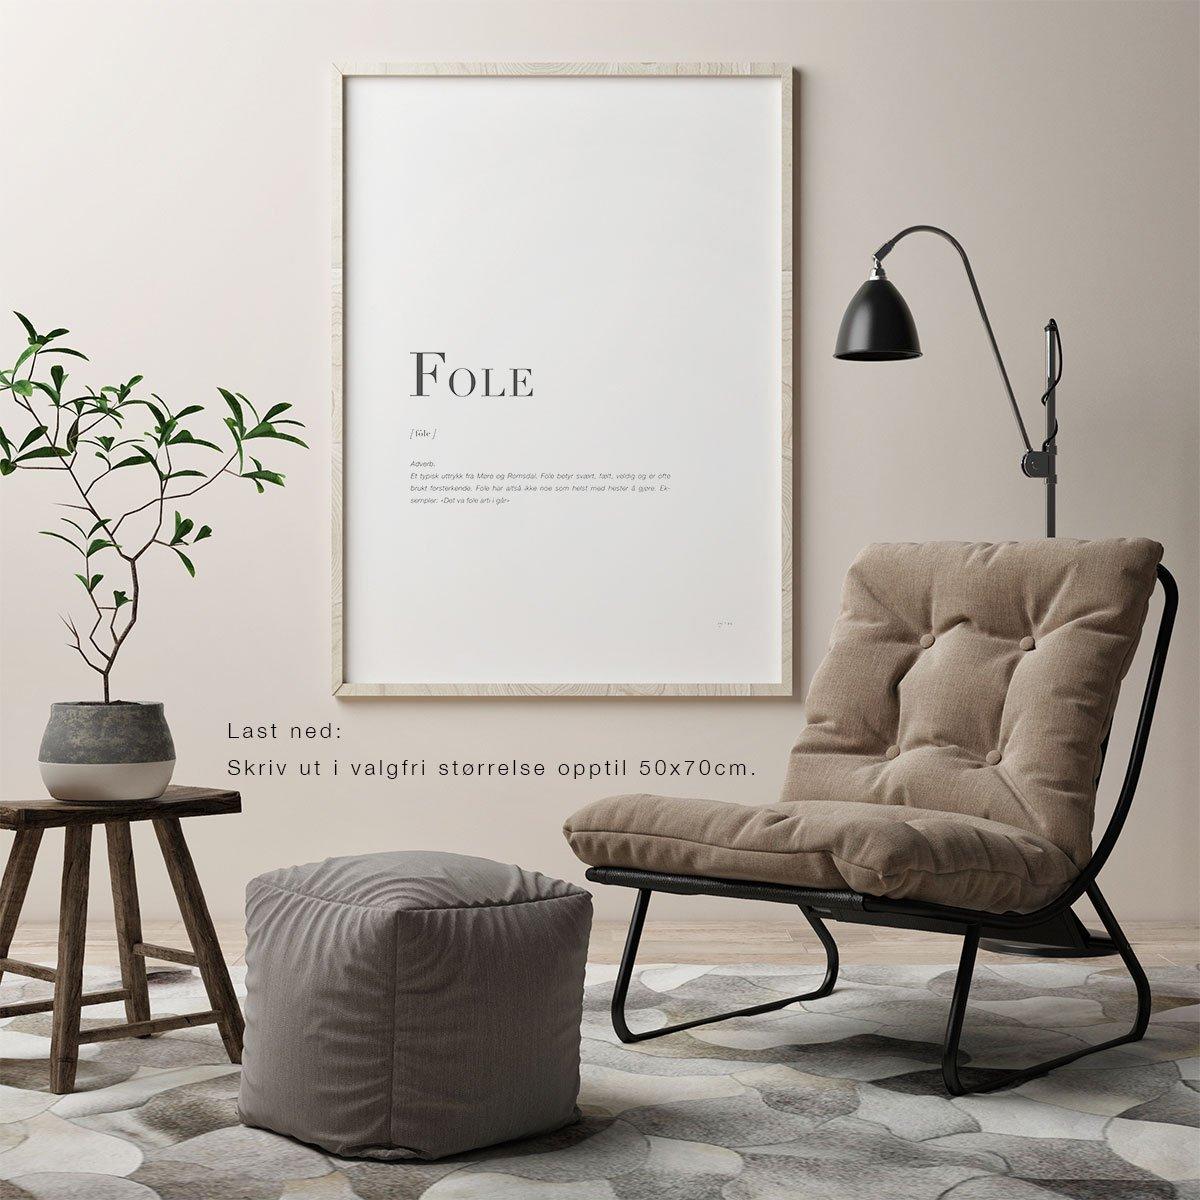 FOLE-Last ned